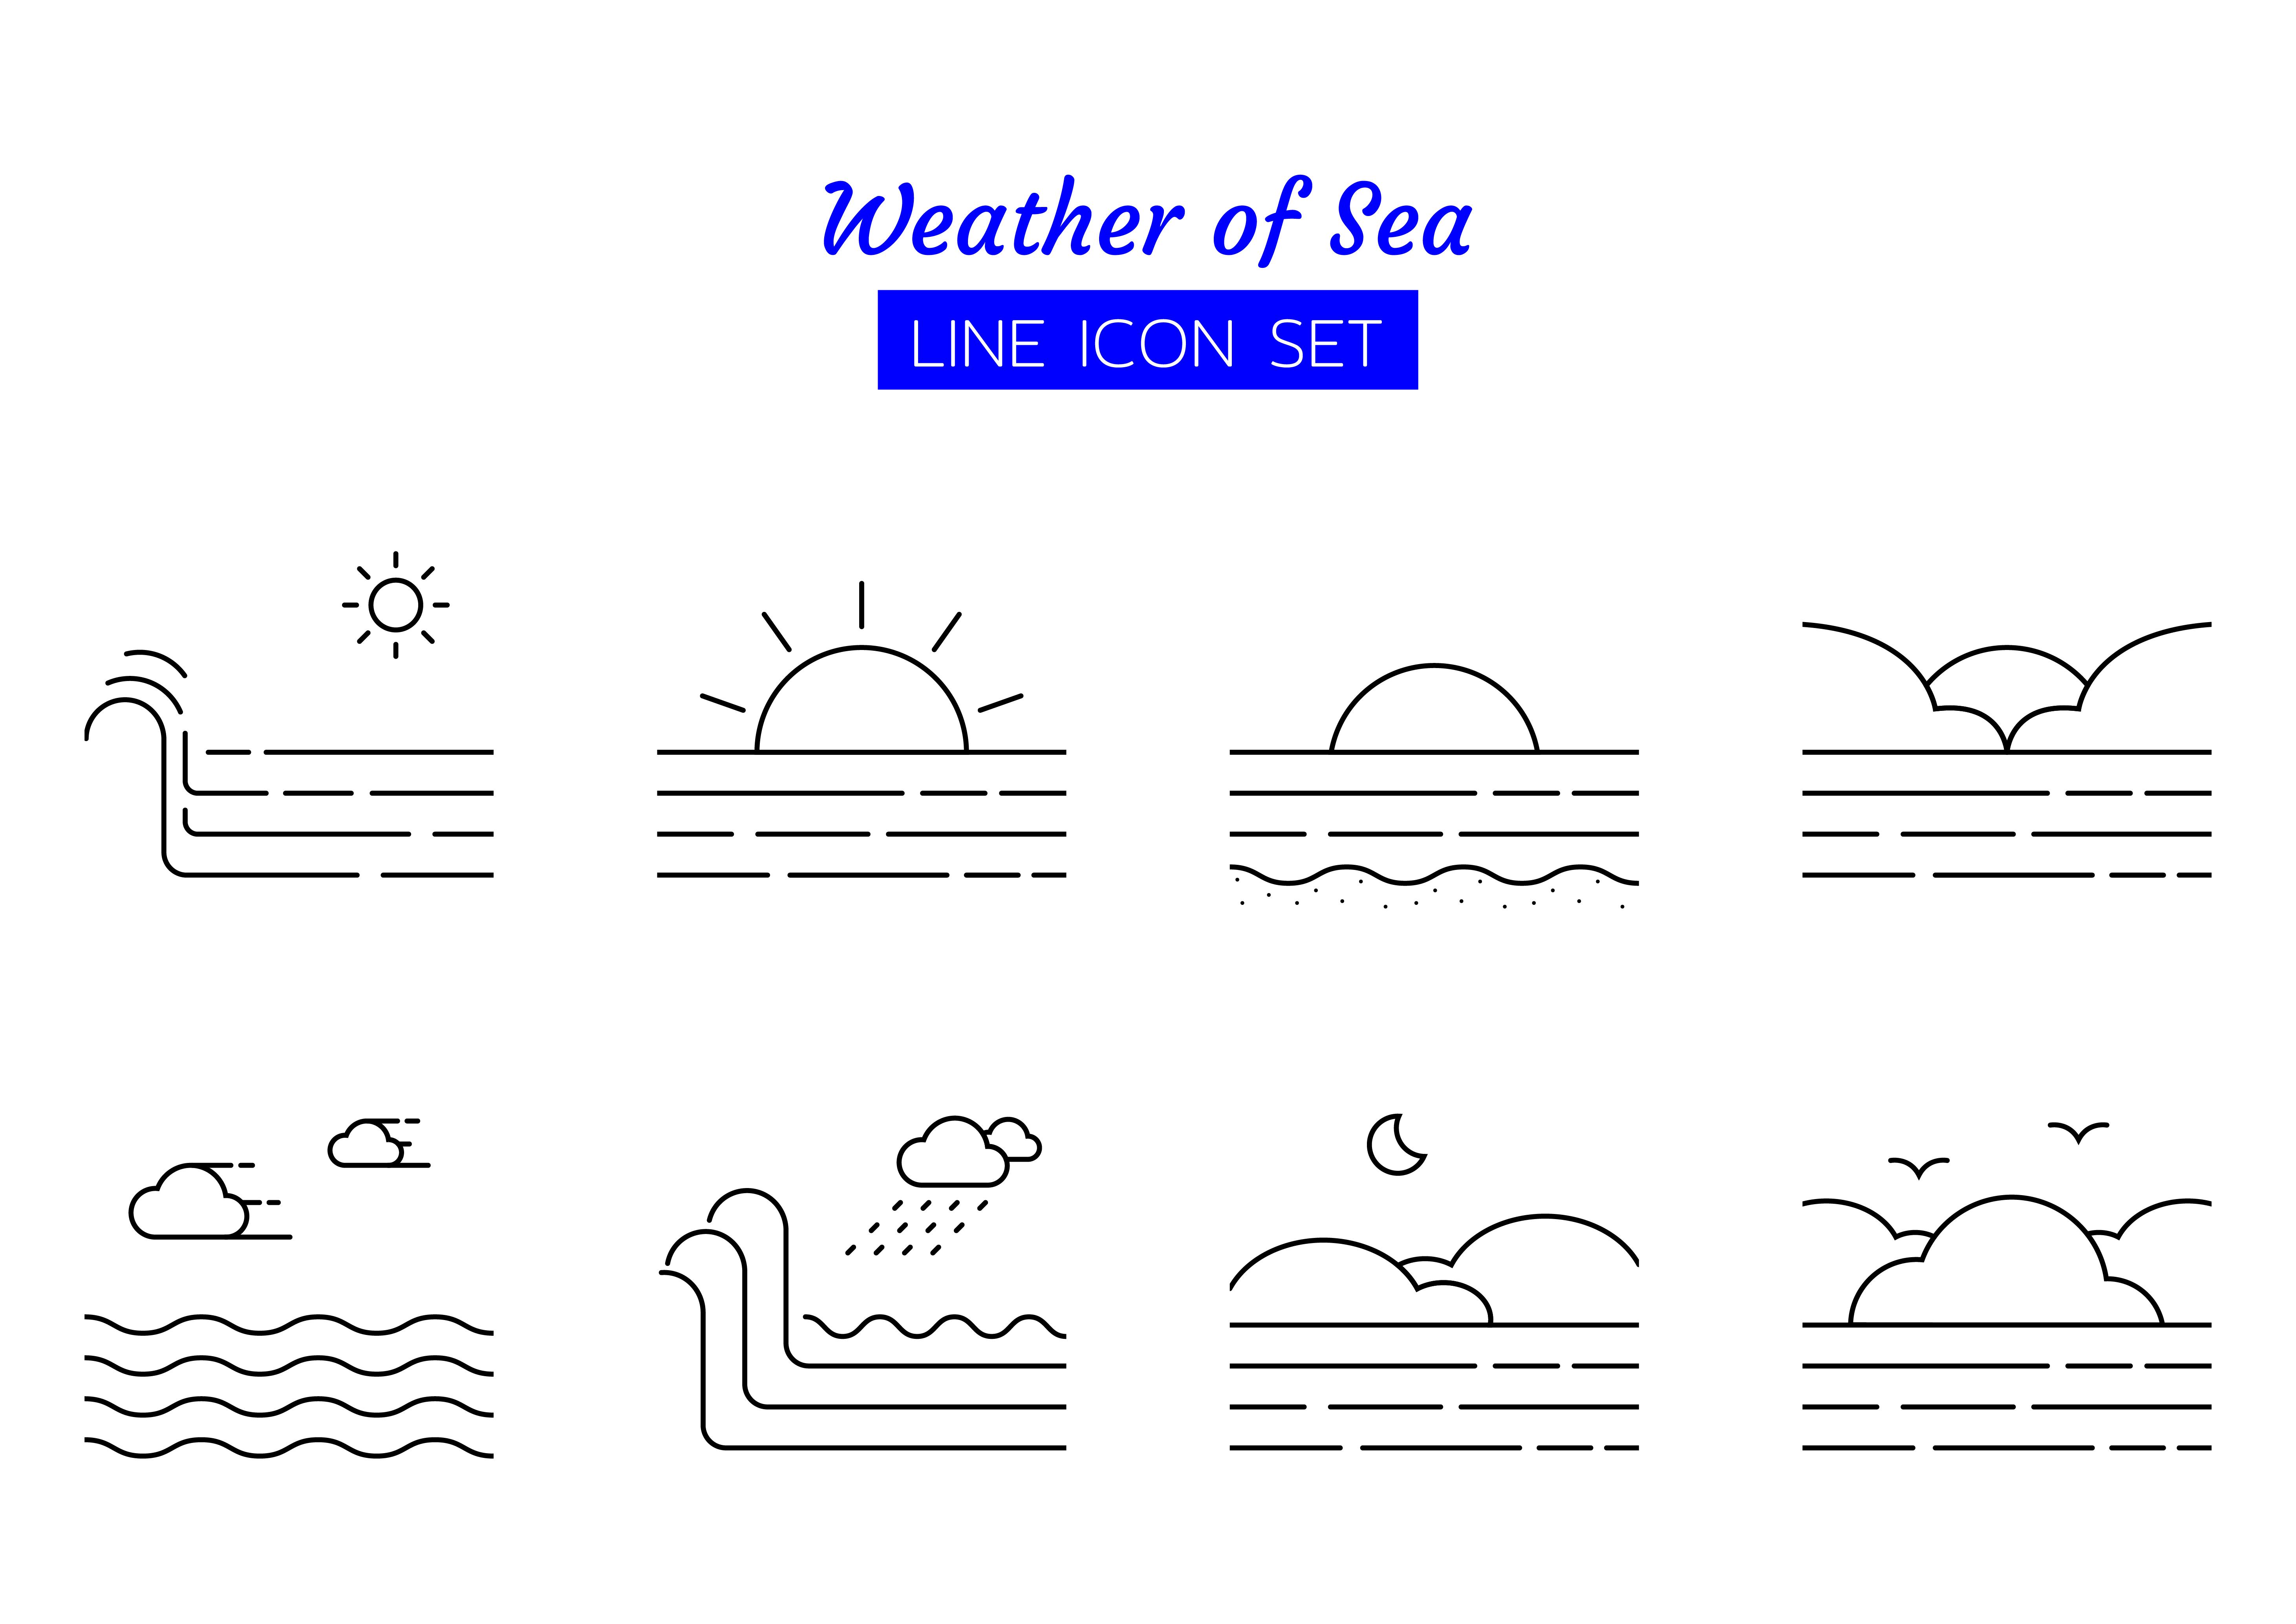 Sea weather line icon symbol set